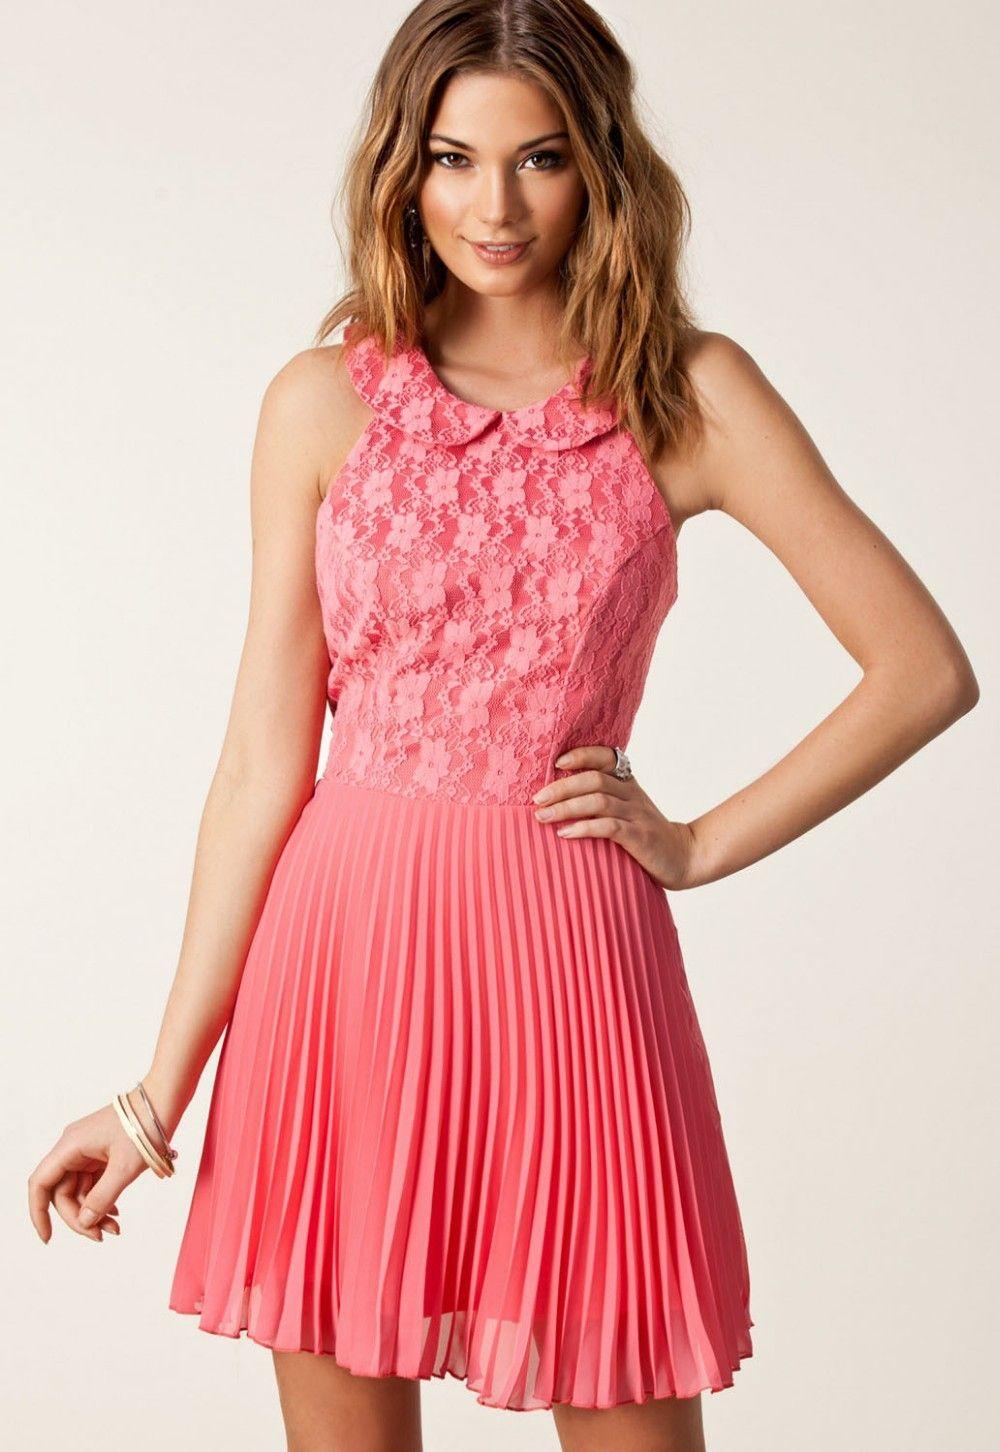 Vestido Rosa Chiffon Plissado Sexy  dd69d3dfb1e0